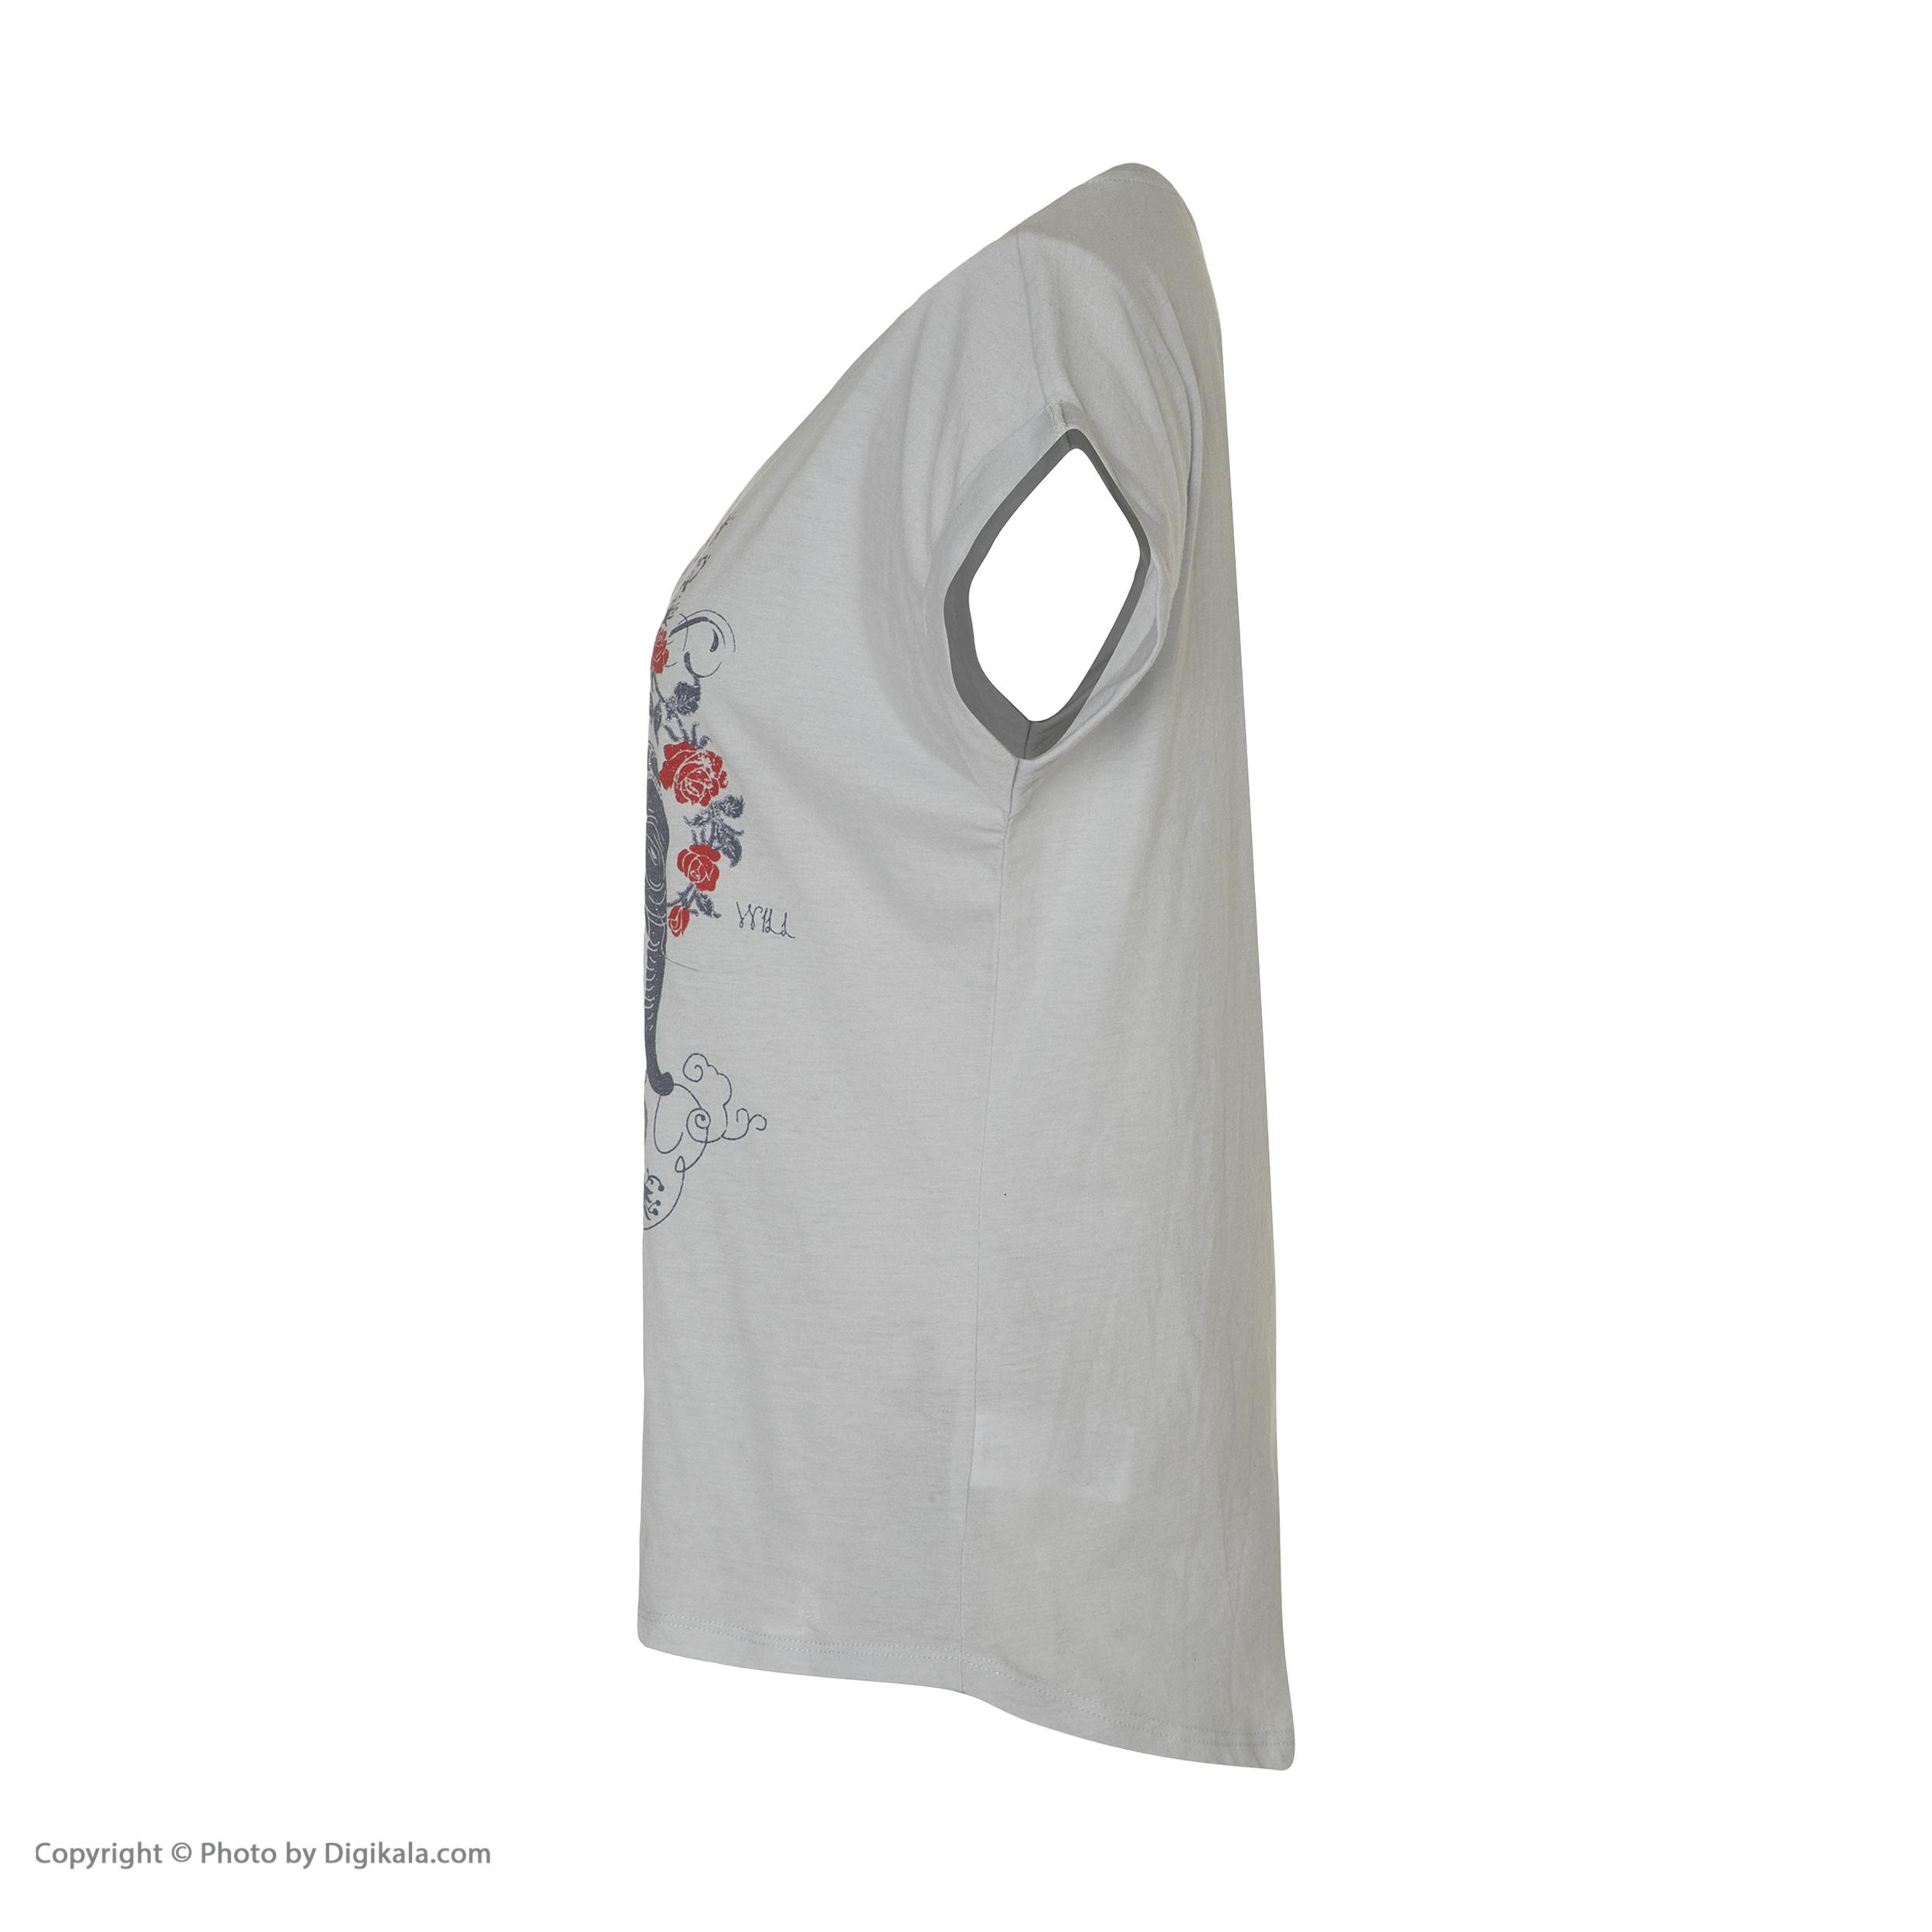 تی شرت زنانه کالینز مدل CL1033142-LIGHTBLUE main 1 2